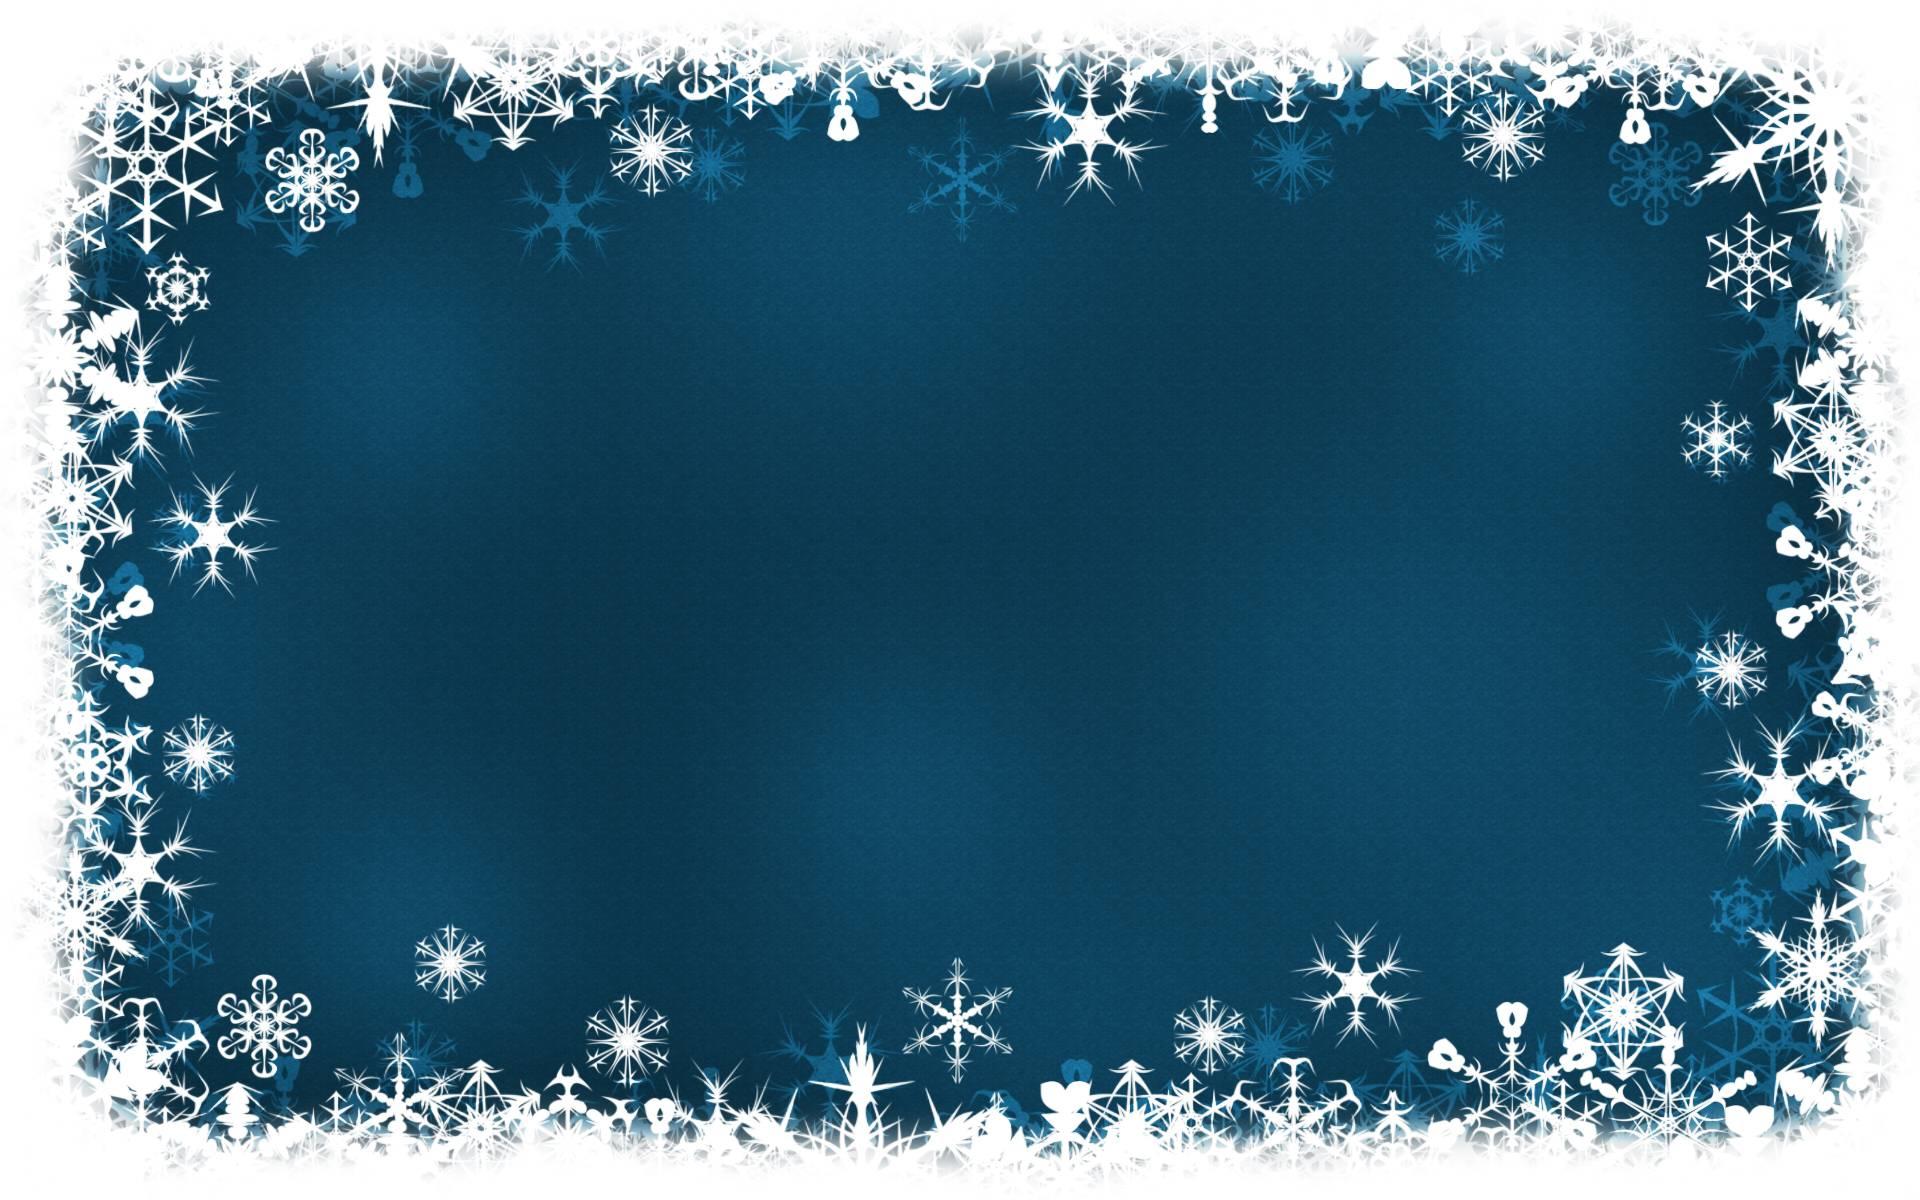 Christmas Background 11 Backgrounds   Wallruru.